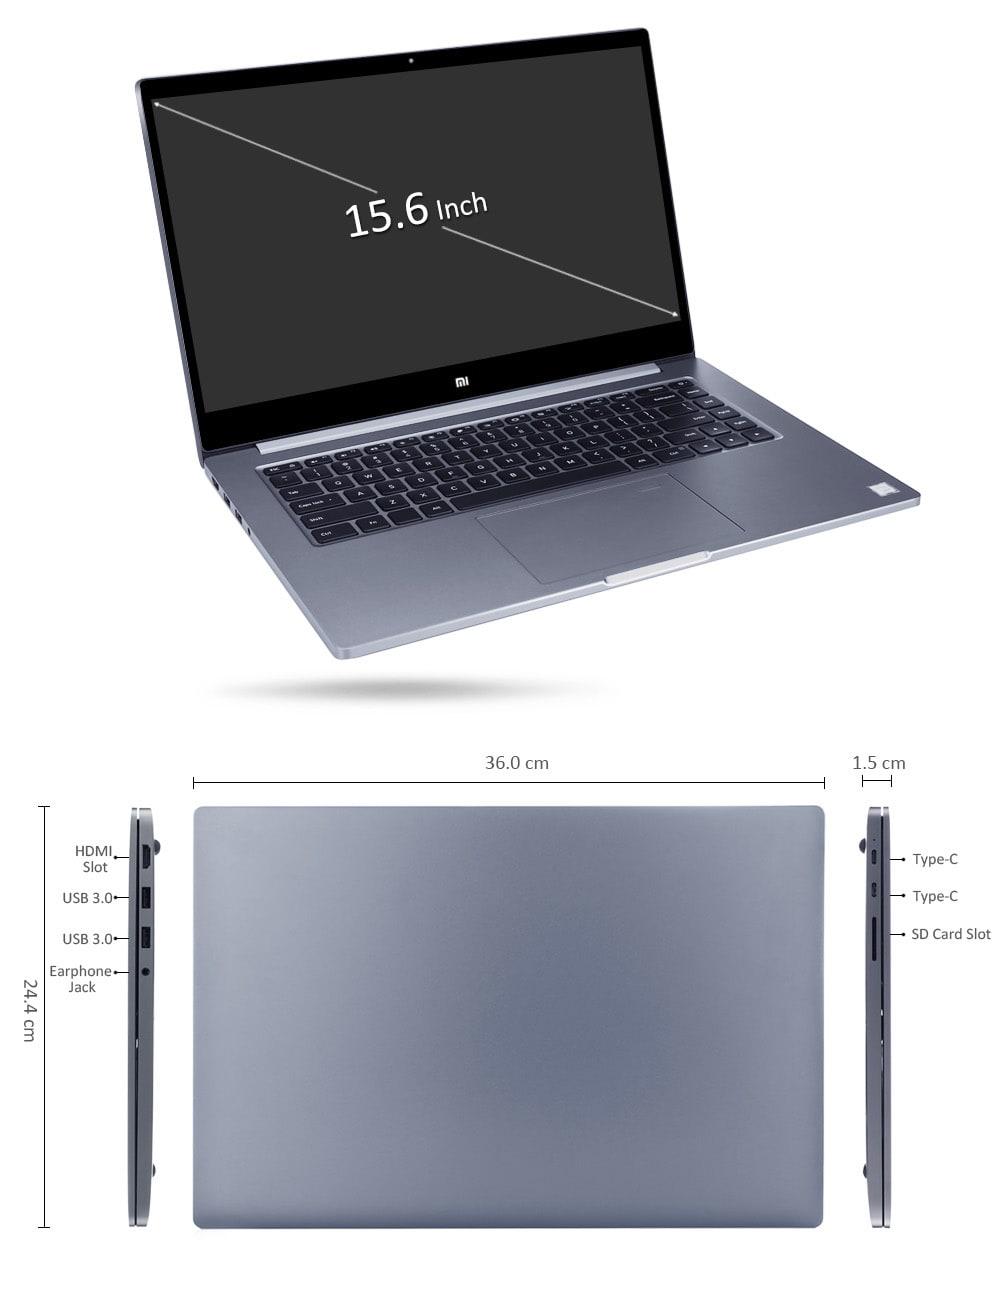 xiaomi_mi_notebook_pro_7.jpg